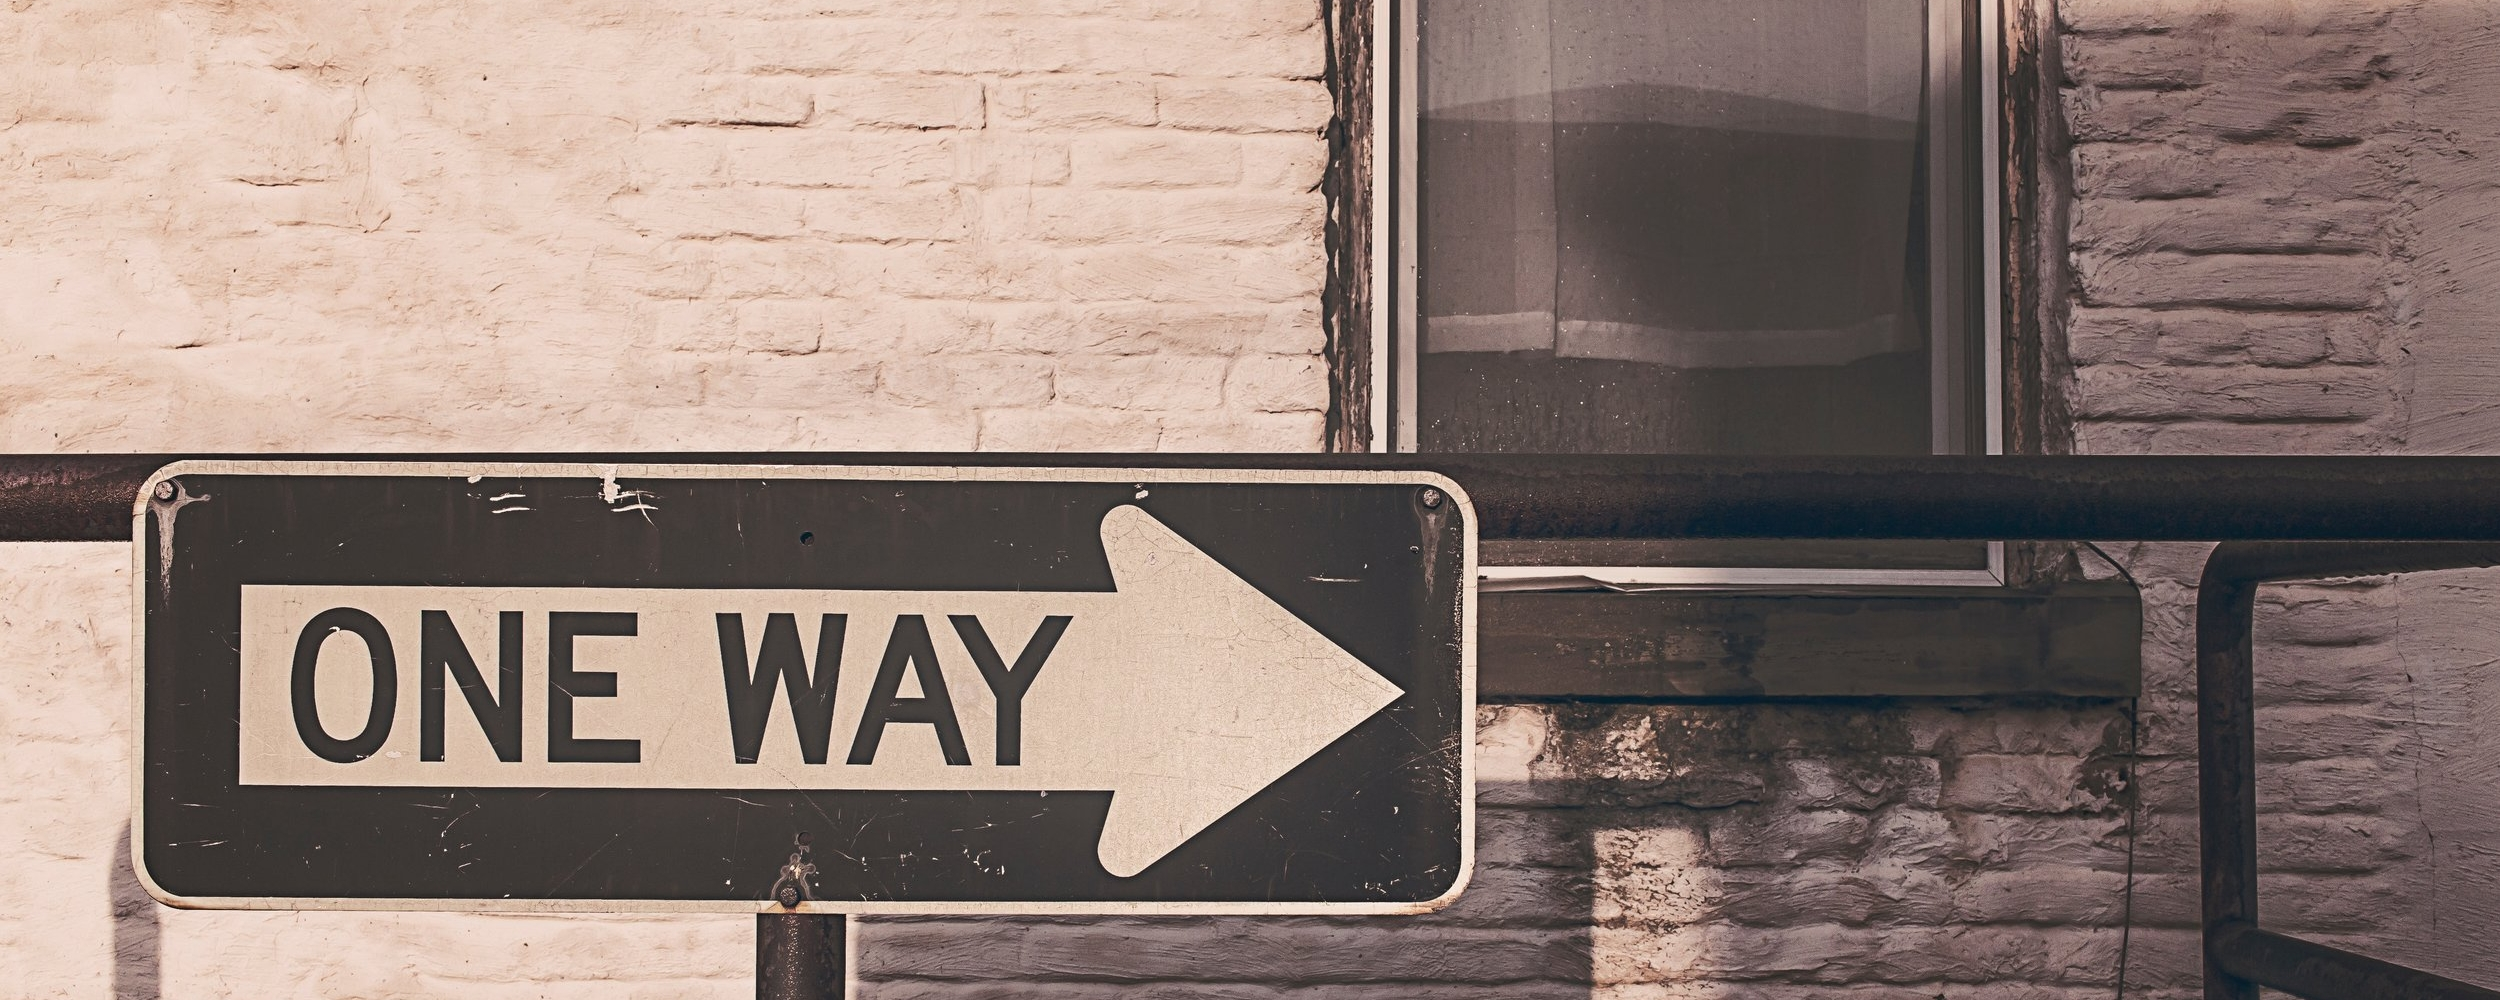 arrow-direction-one-way-536.jpg